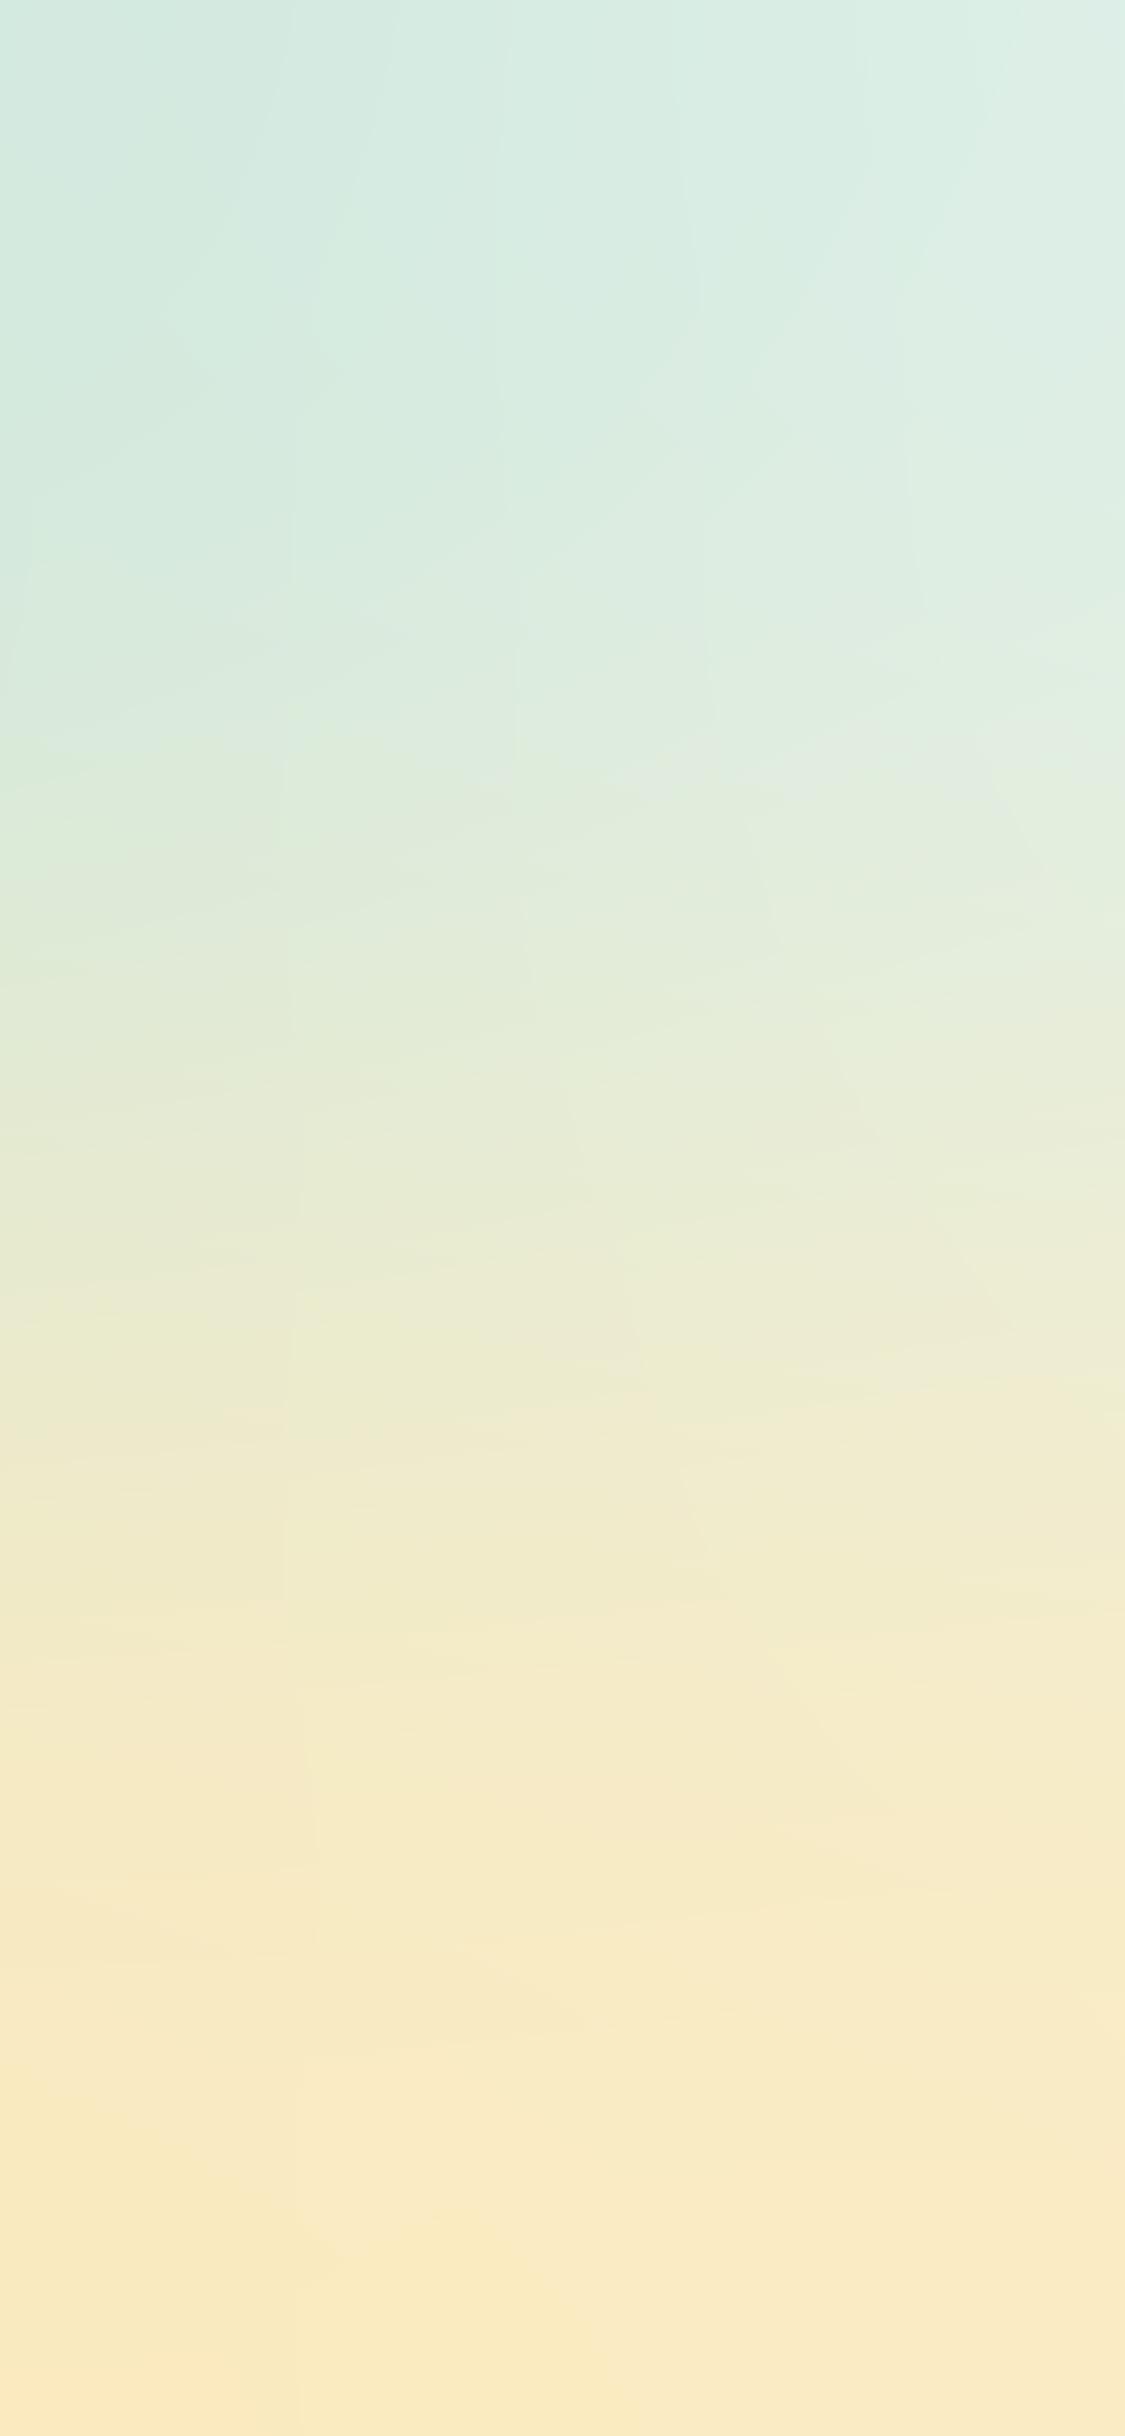 papers.co sn88 light soft pastel blur gradation 41 iphone wallpaper